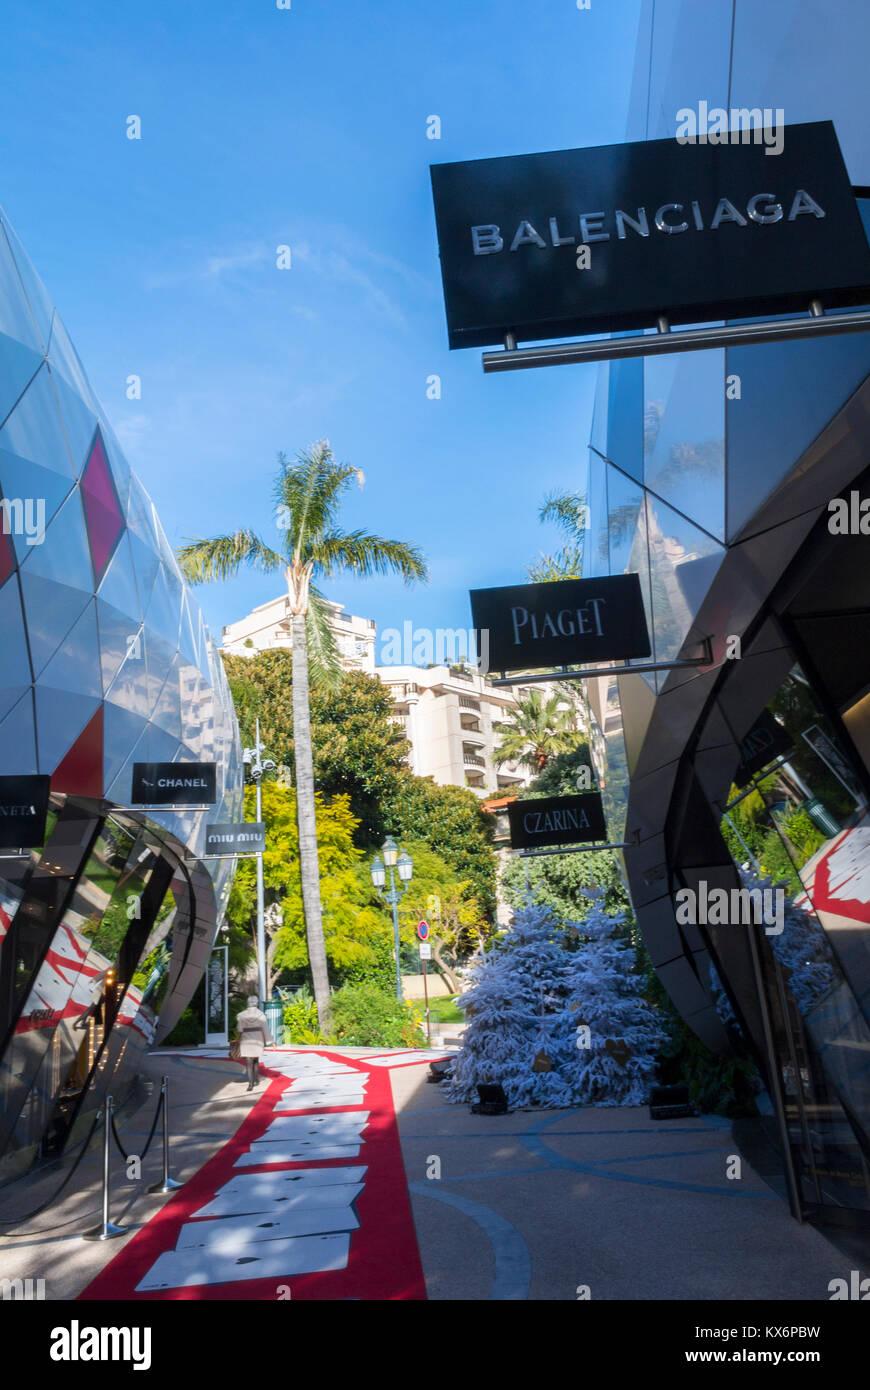 Monaco, Monte Carlo, Les Pavillions, Luxury Shops, Balenciaga Store, Shopping Center - Stock Image